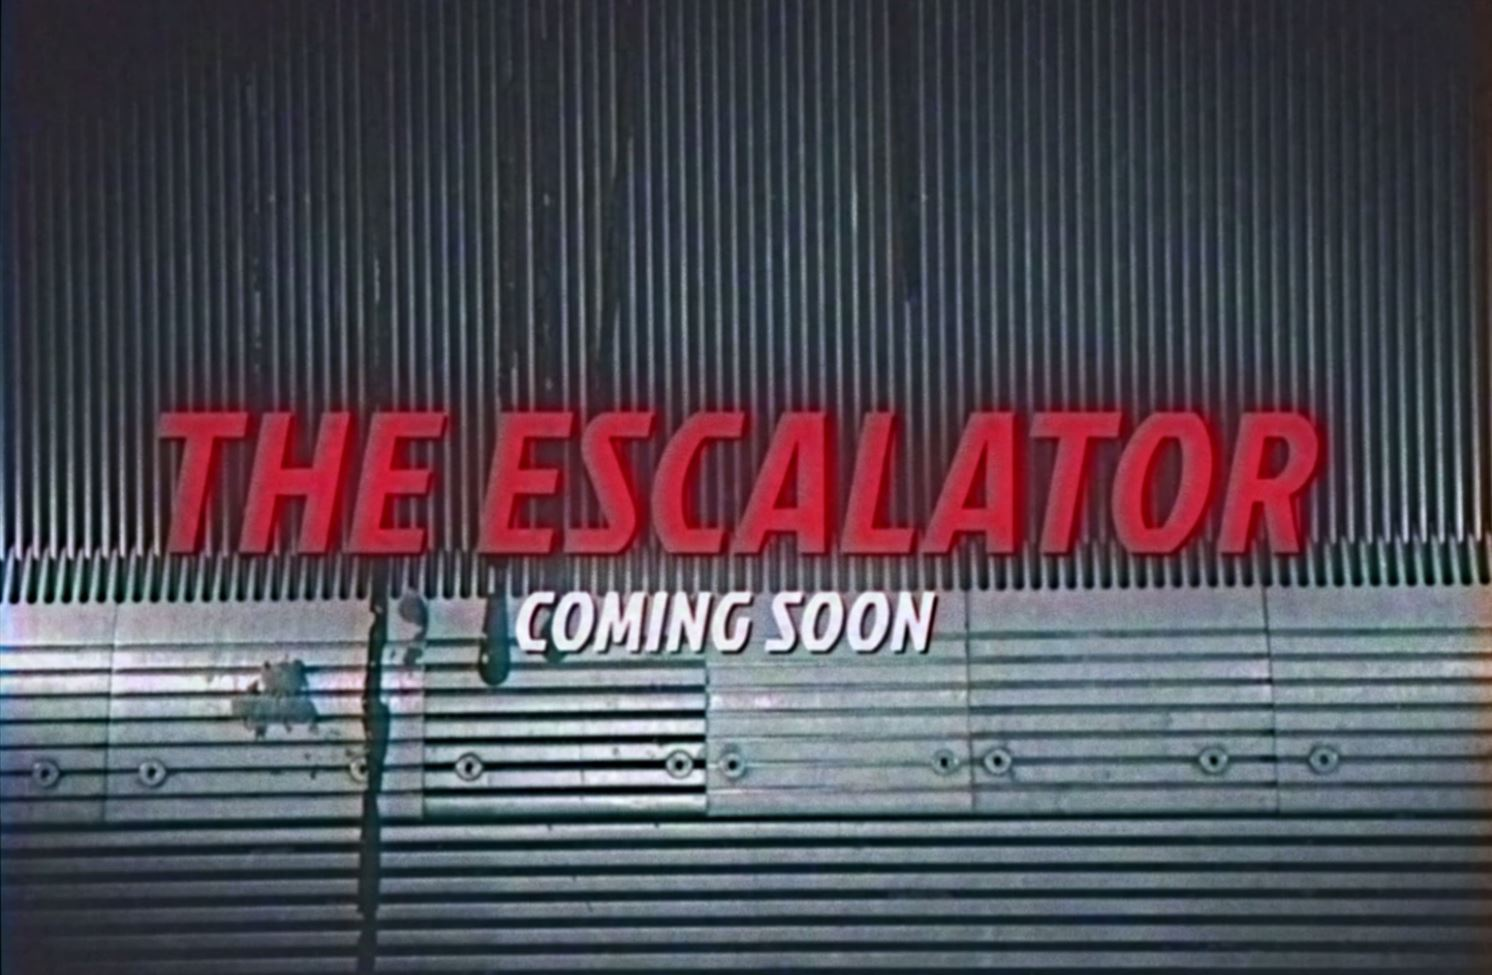 The Escalator: speel geen hoofdrol